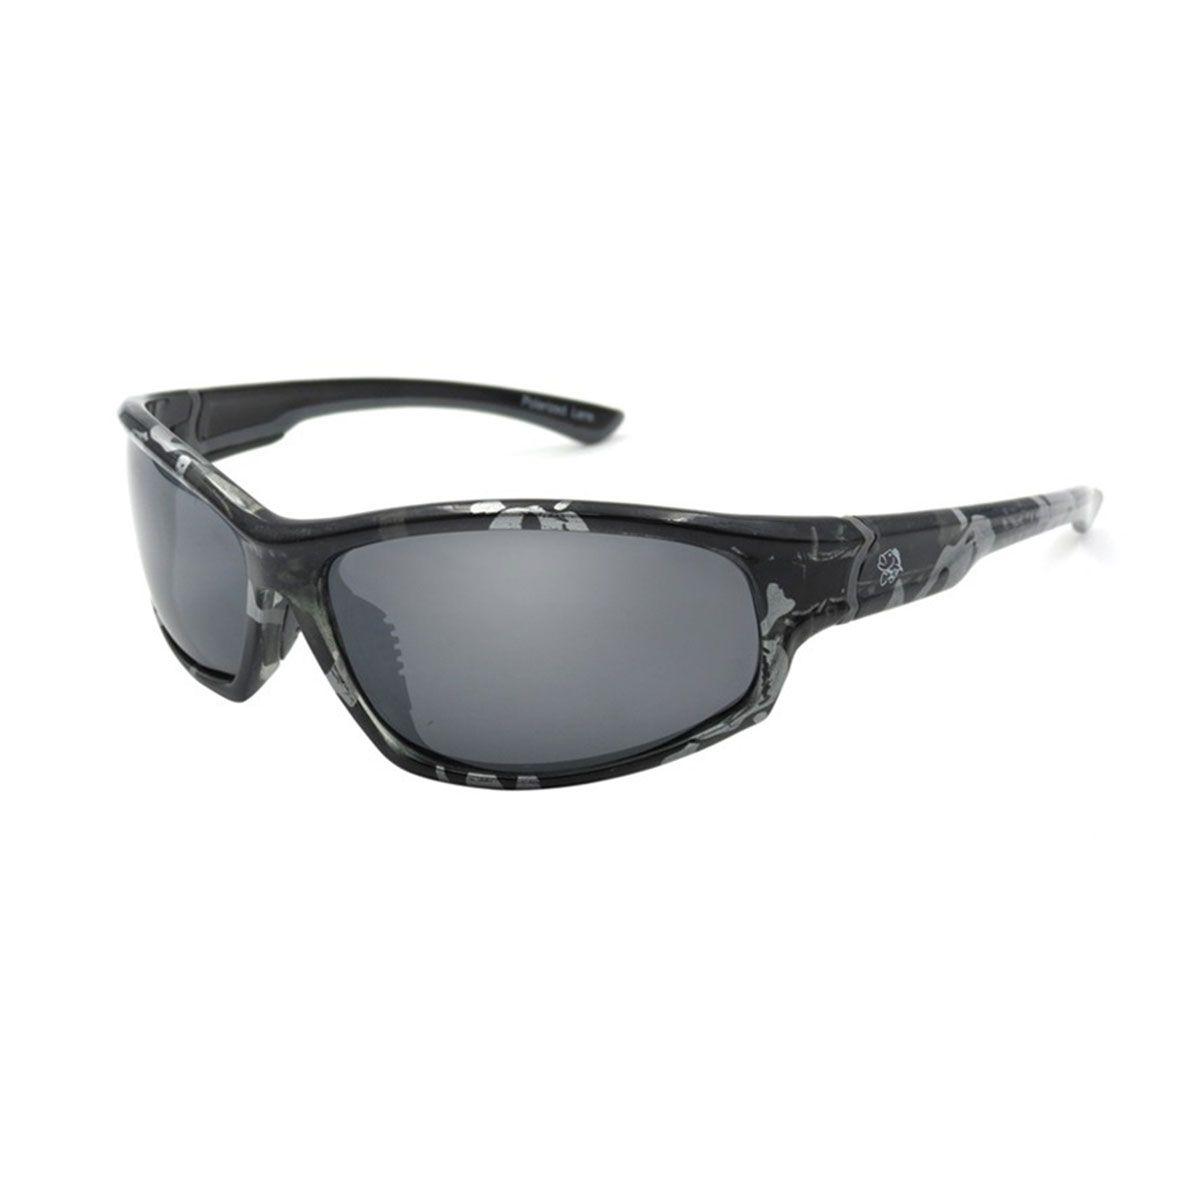 Oculos Polarizado Pro Tsuri Skull Armacao Caveira Lente Grey Mirror